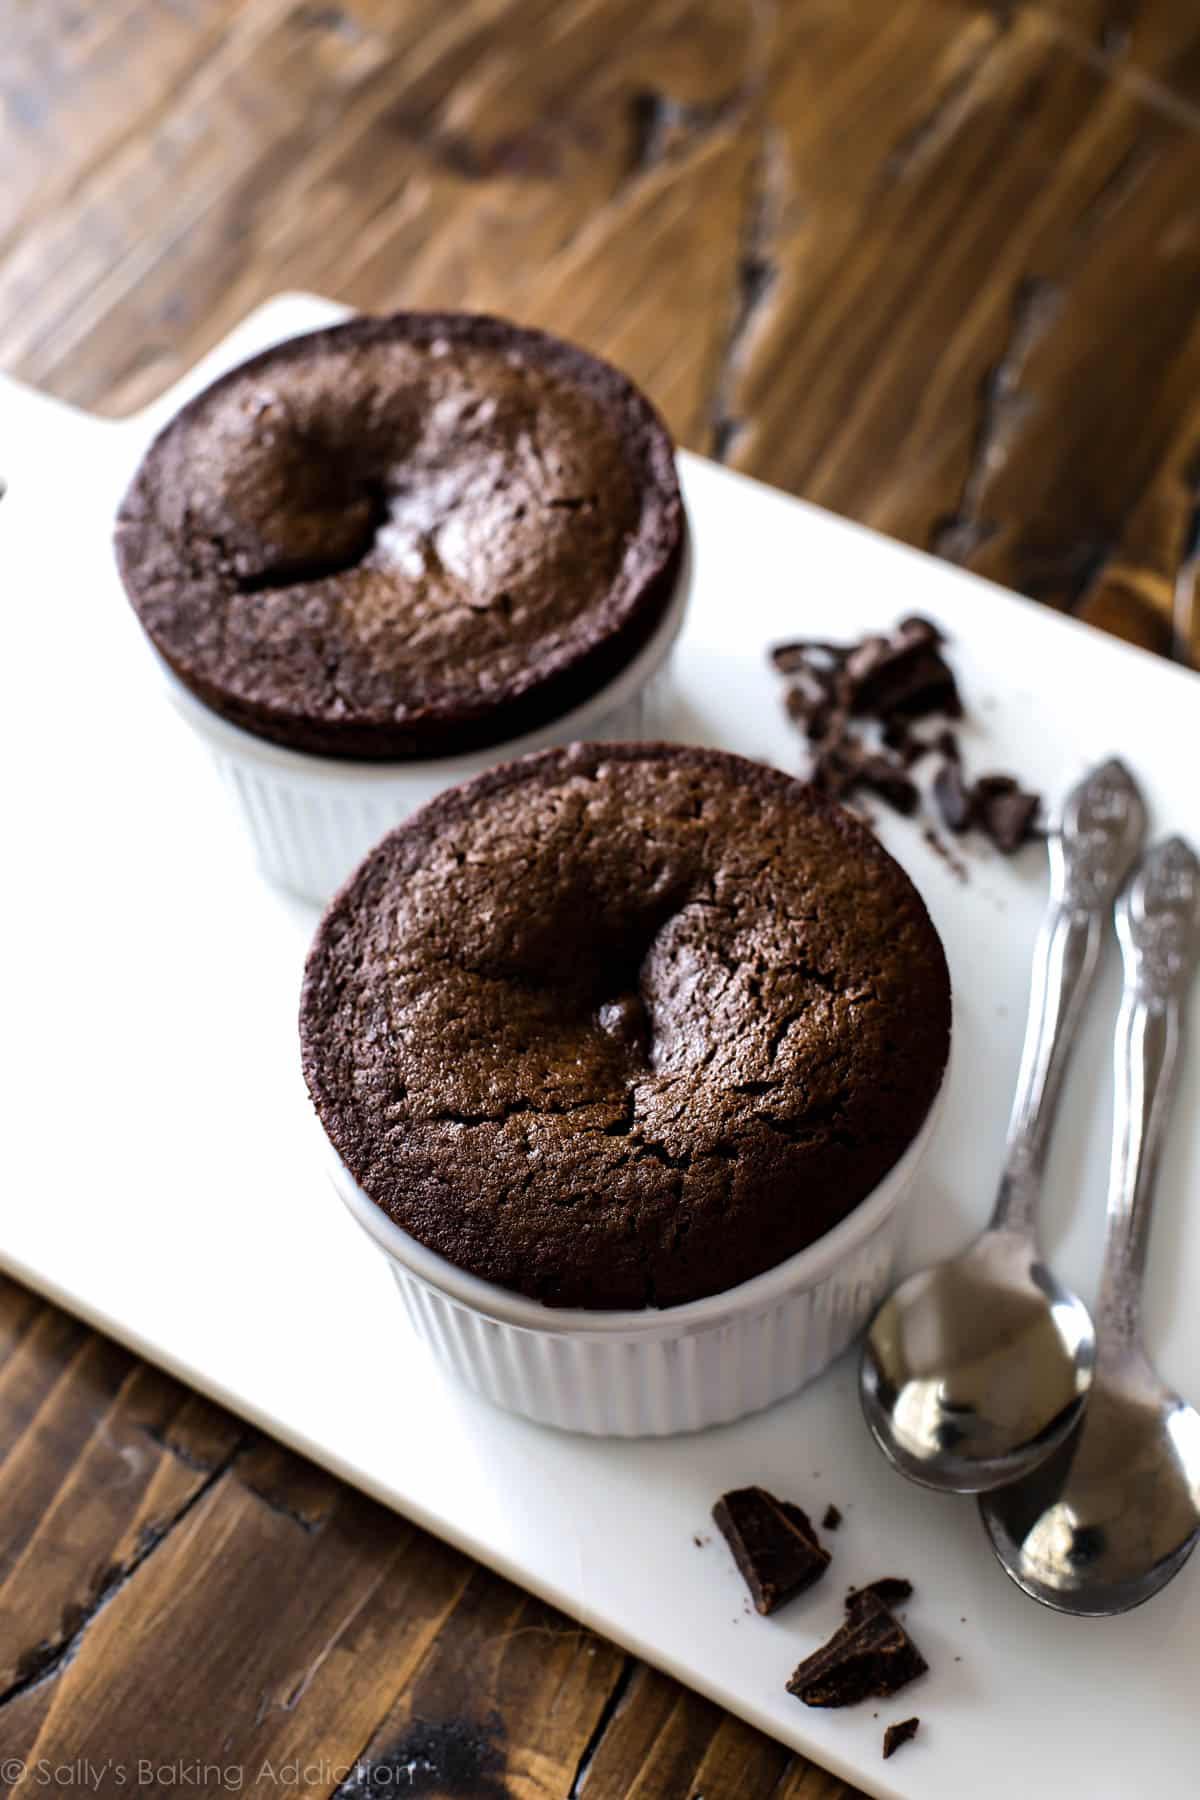 Chocolate fudge cakes for 2!! Easy chocolate lava cakes serving only 2 on sallysbakingaddiction.com